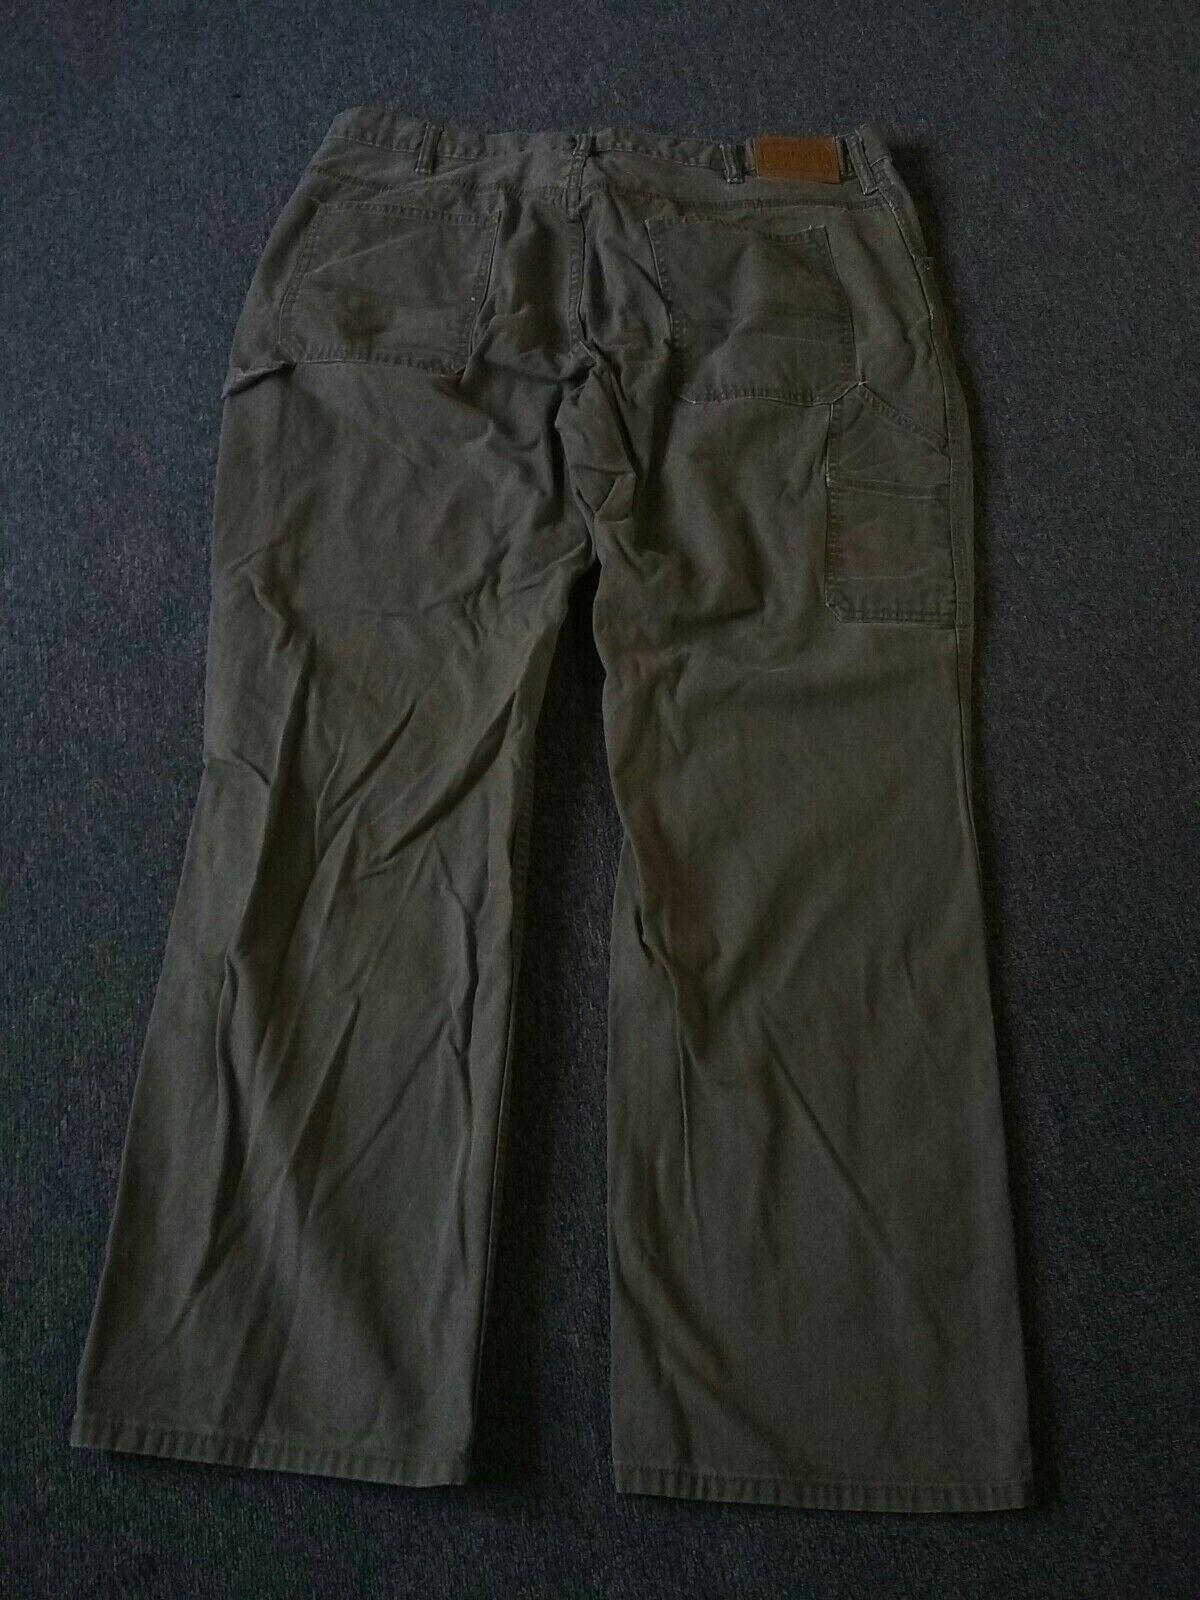 Men's C.E. Schmidt Workwear 40x34 Carpenter Jeans Work Pants RN